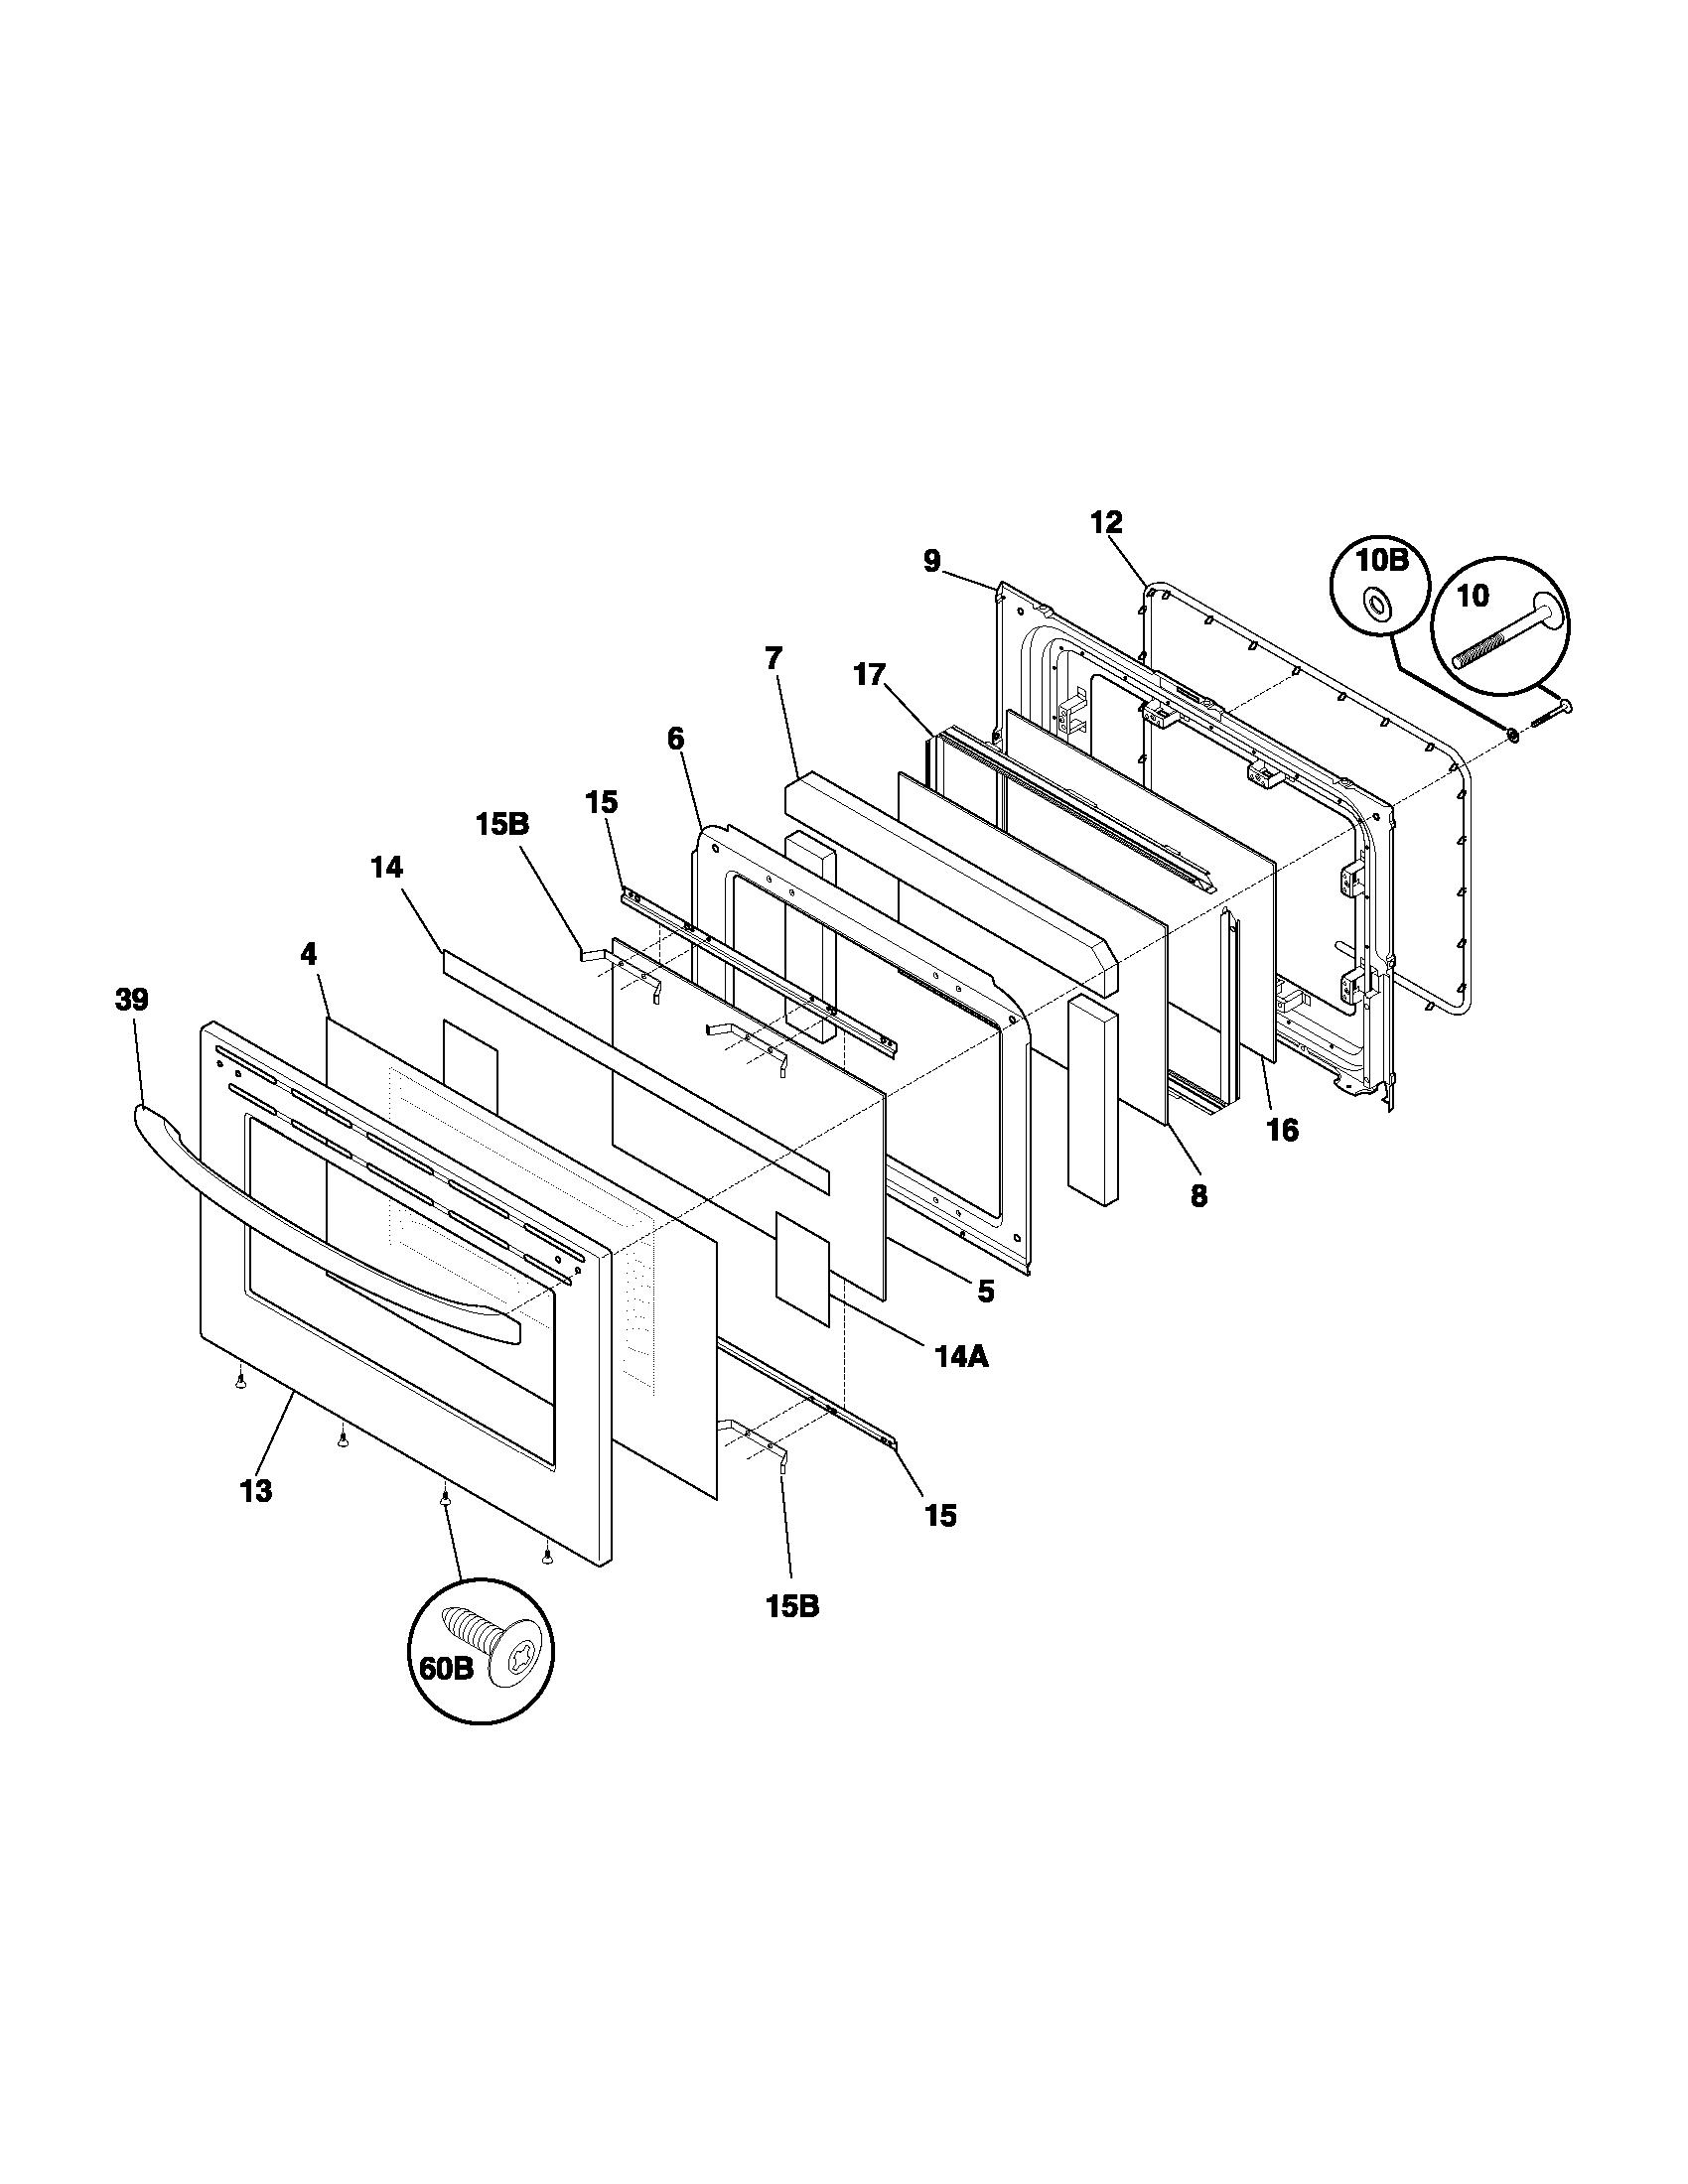 frigidaire wiring diagram driving light narva fef366ccb electric range timer stove clocks